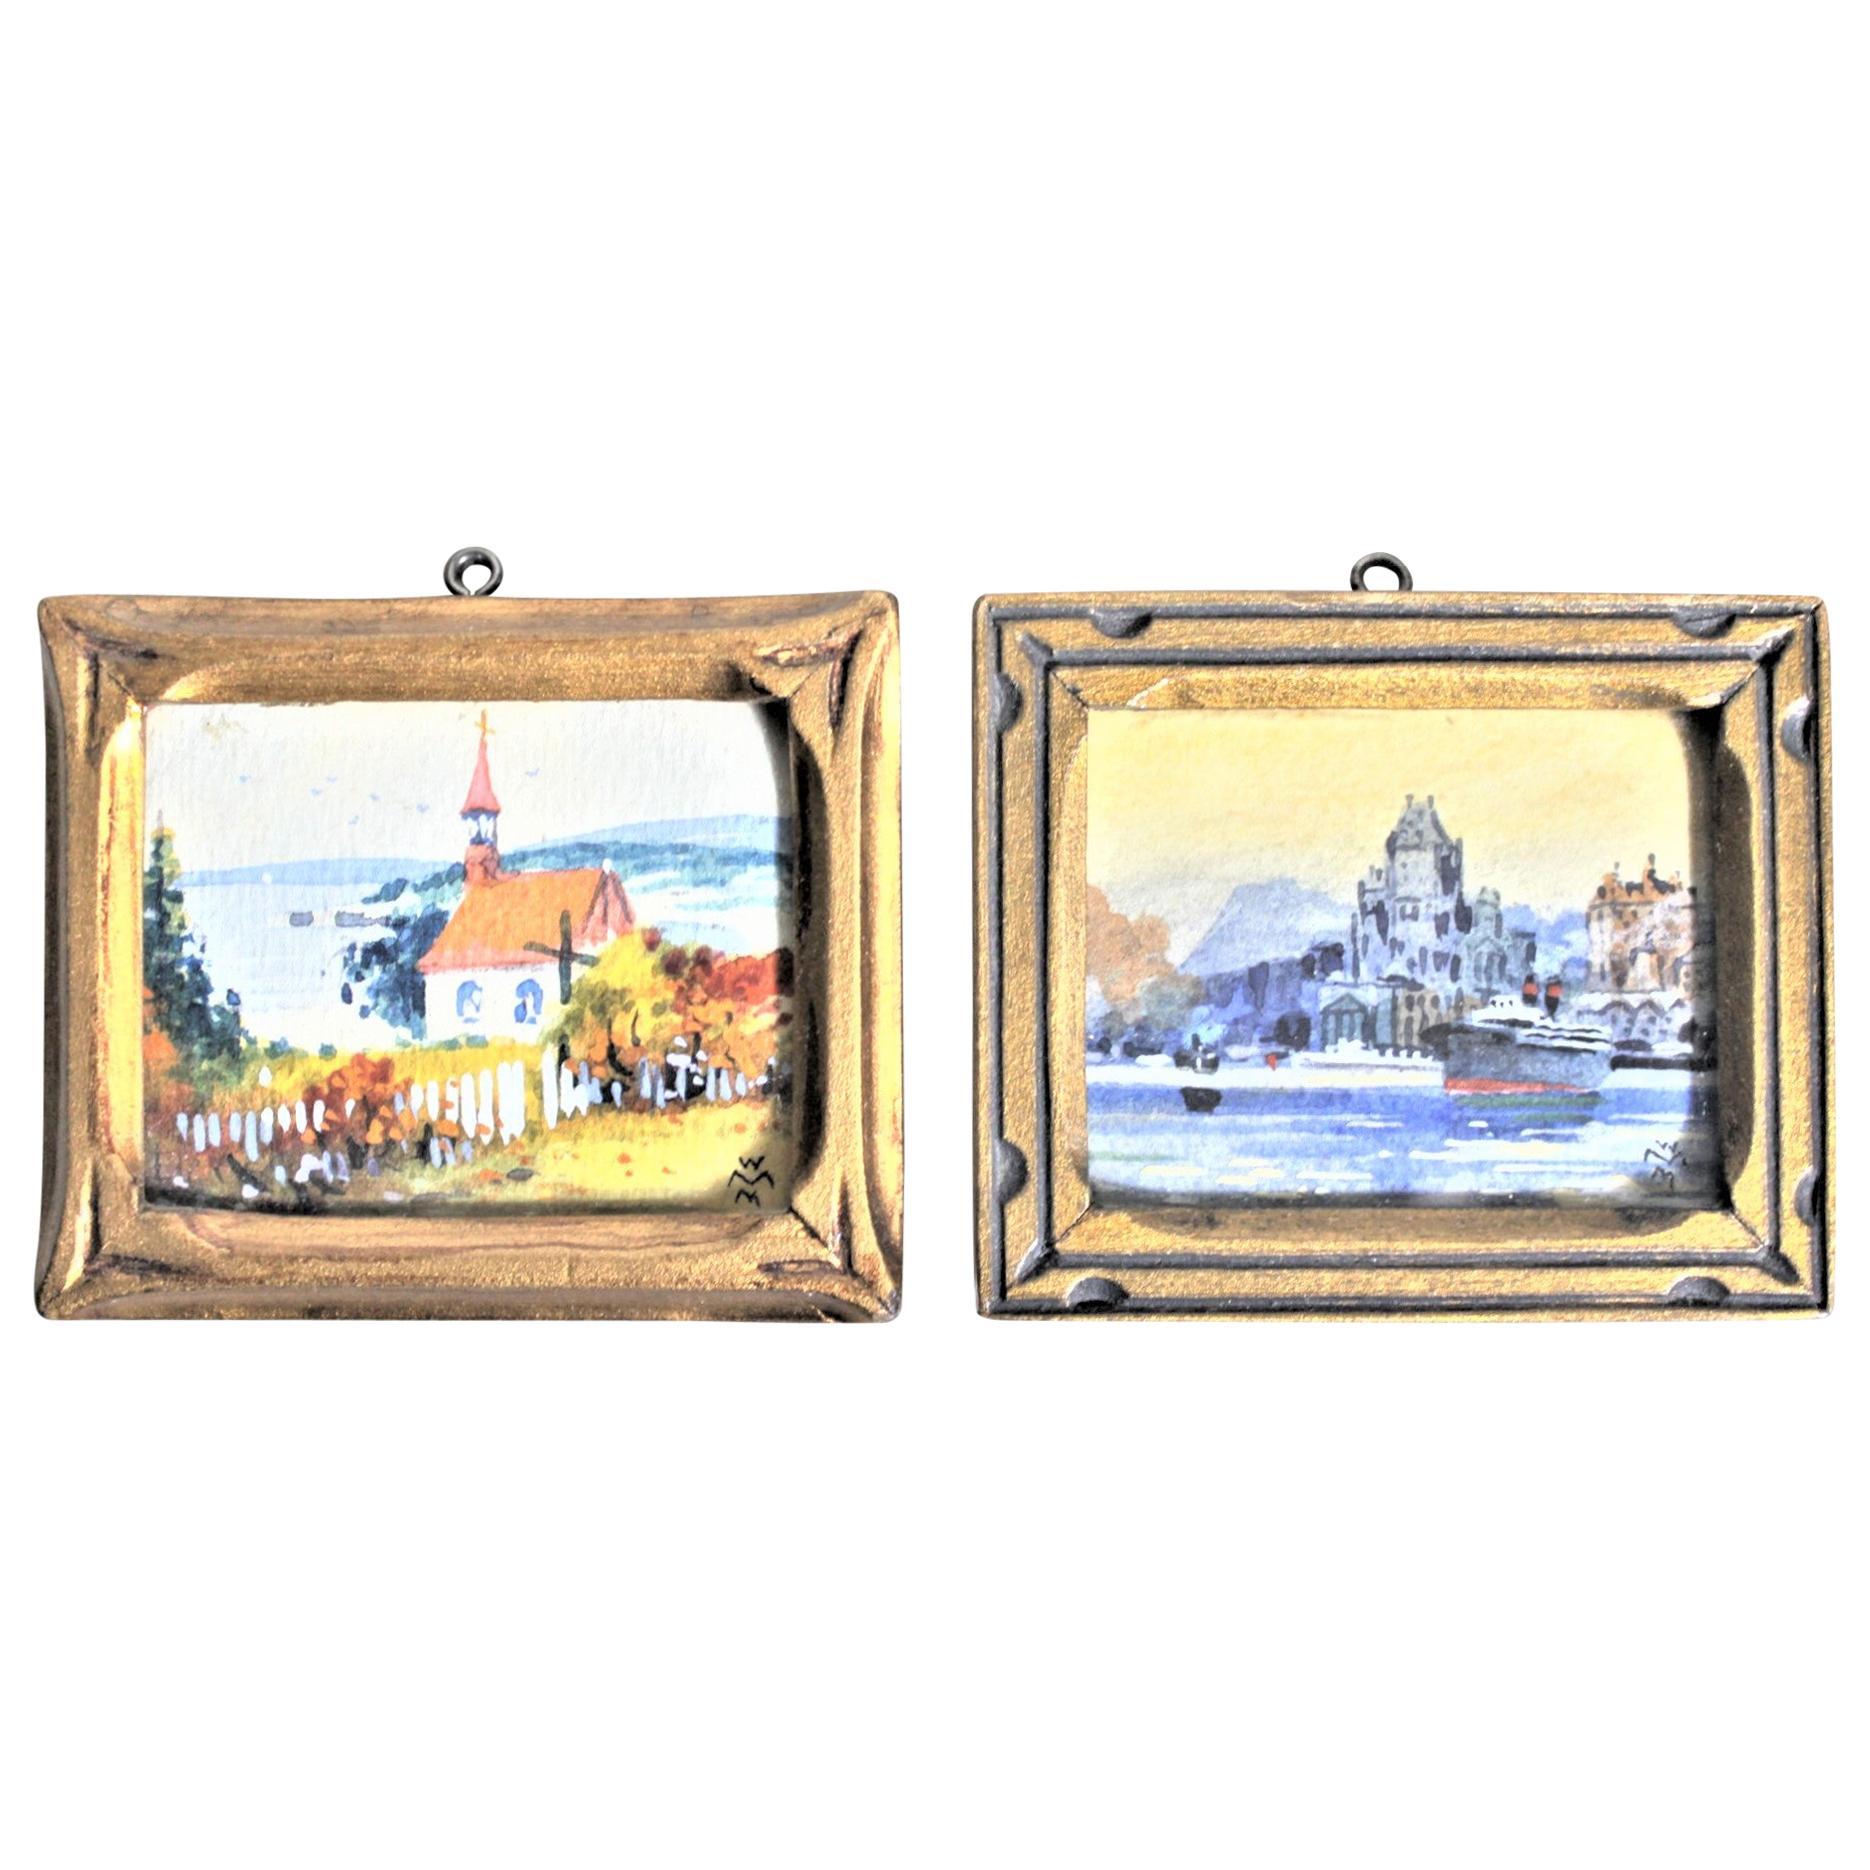 Pair of Original Willard Morse 'William' Mitchell Framed Watercolor Paintings